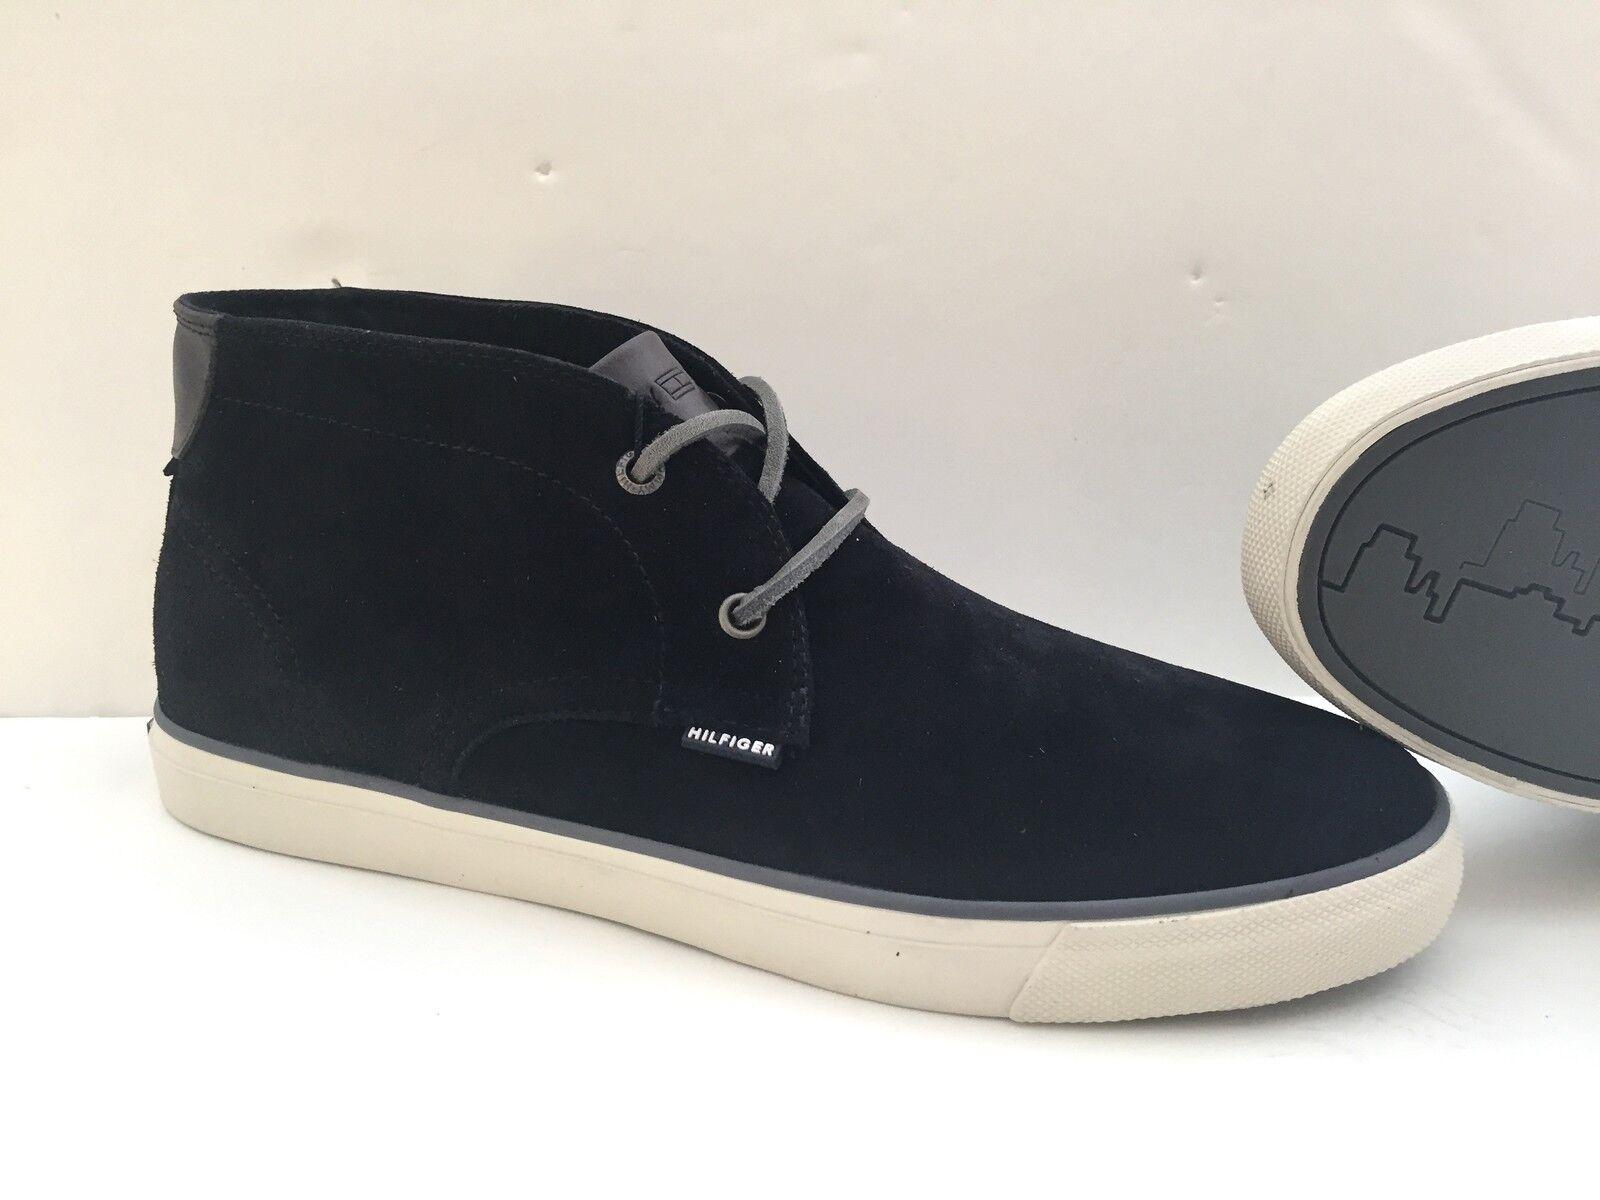 Schuhe Schuhe Schuhe Desert Stiefel Tommy Hilfiger 42 blau man man Gämse Veloursleder New York 165205